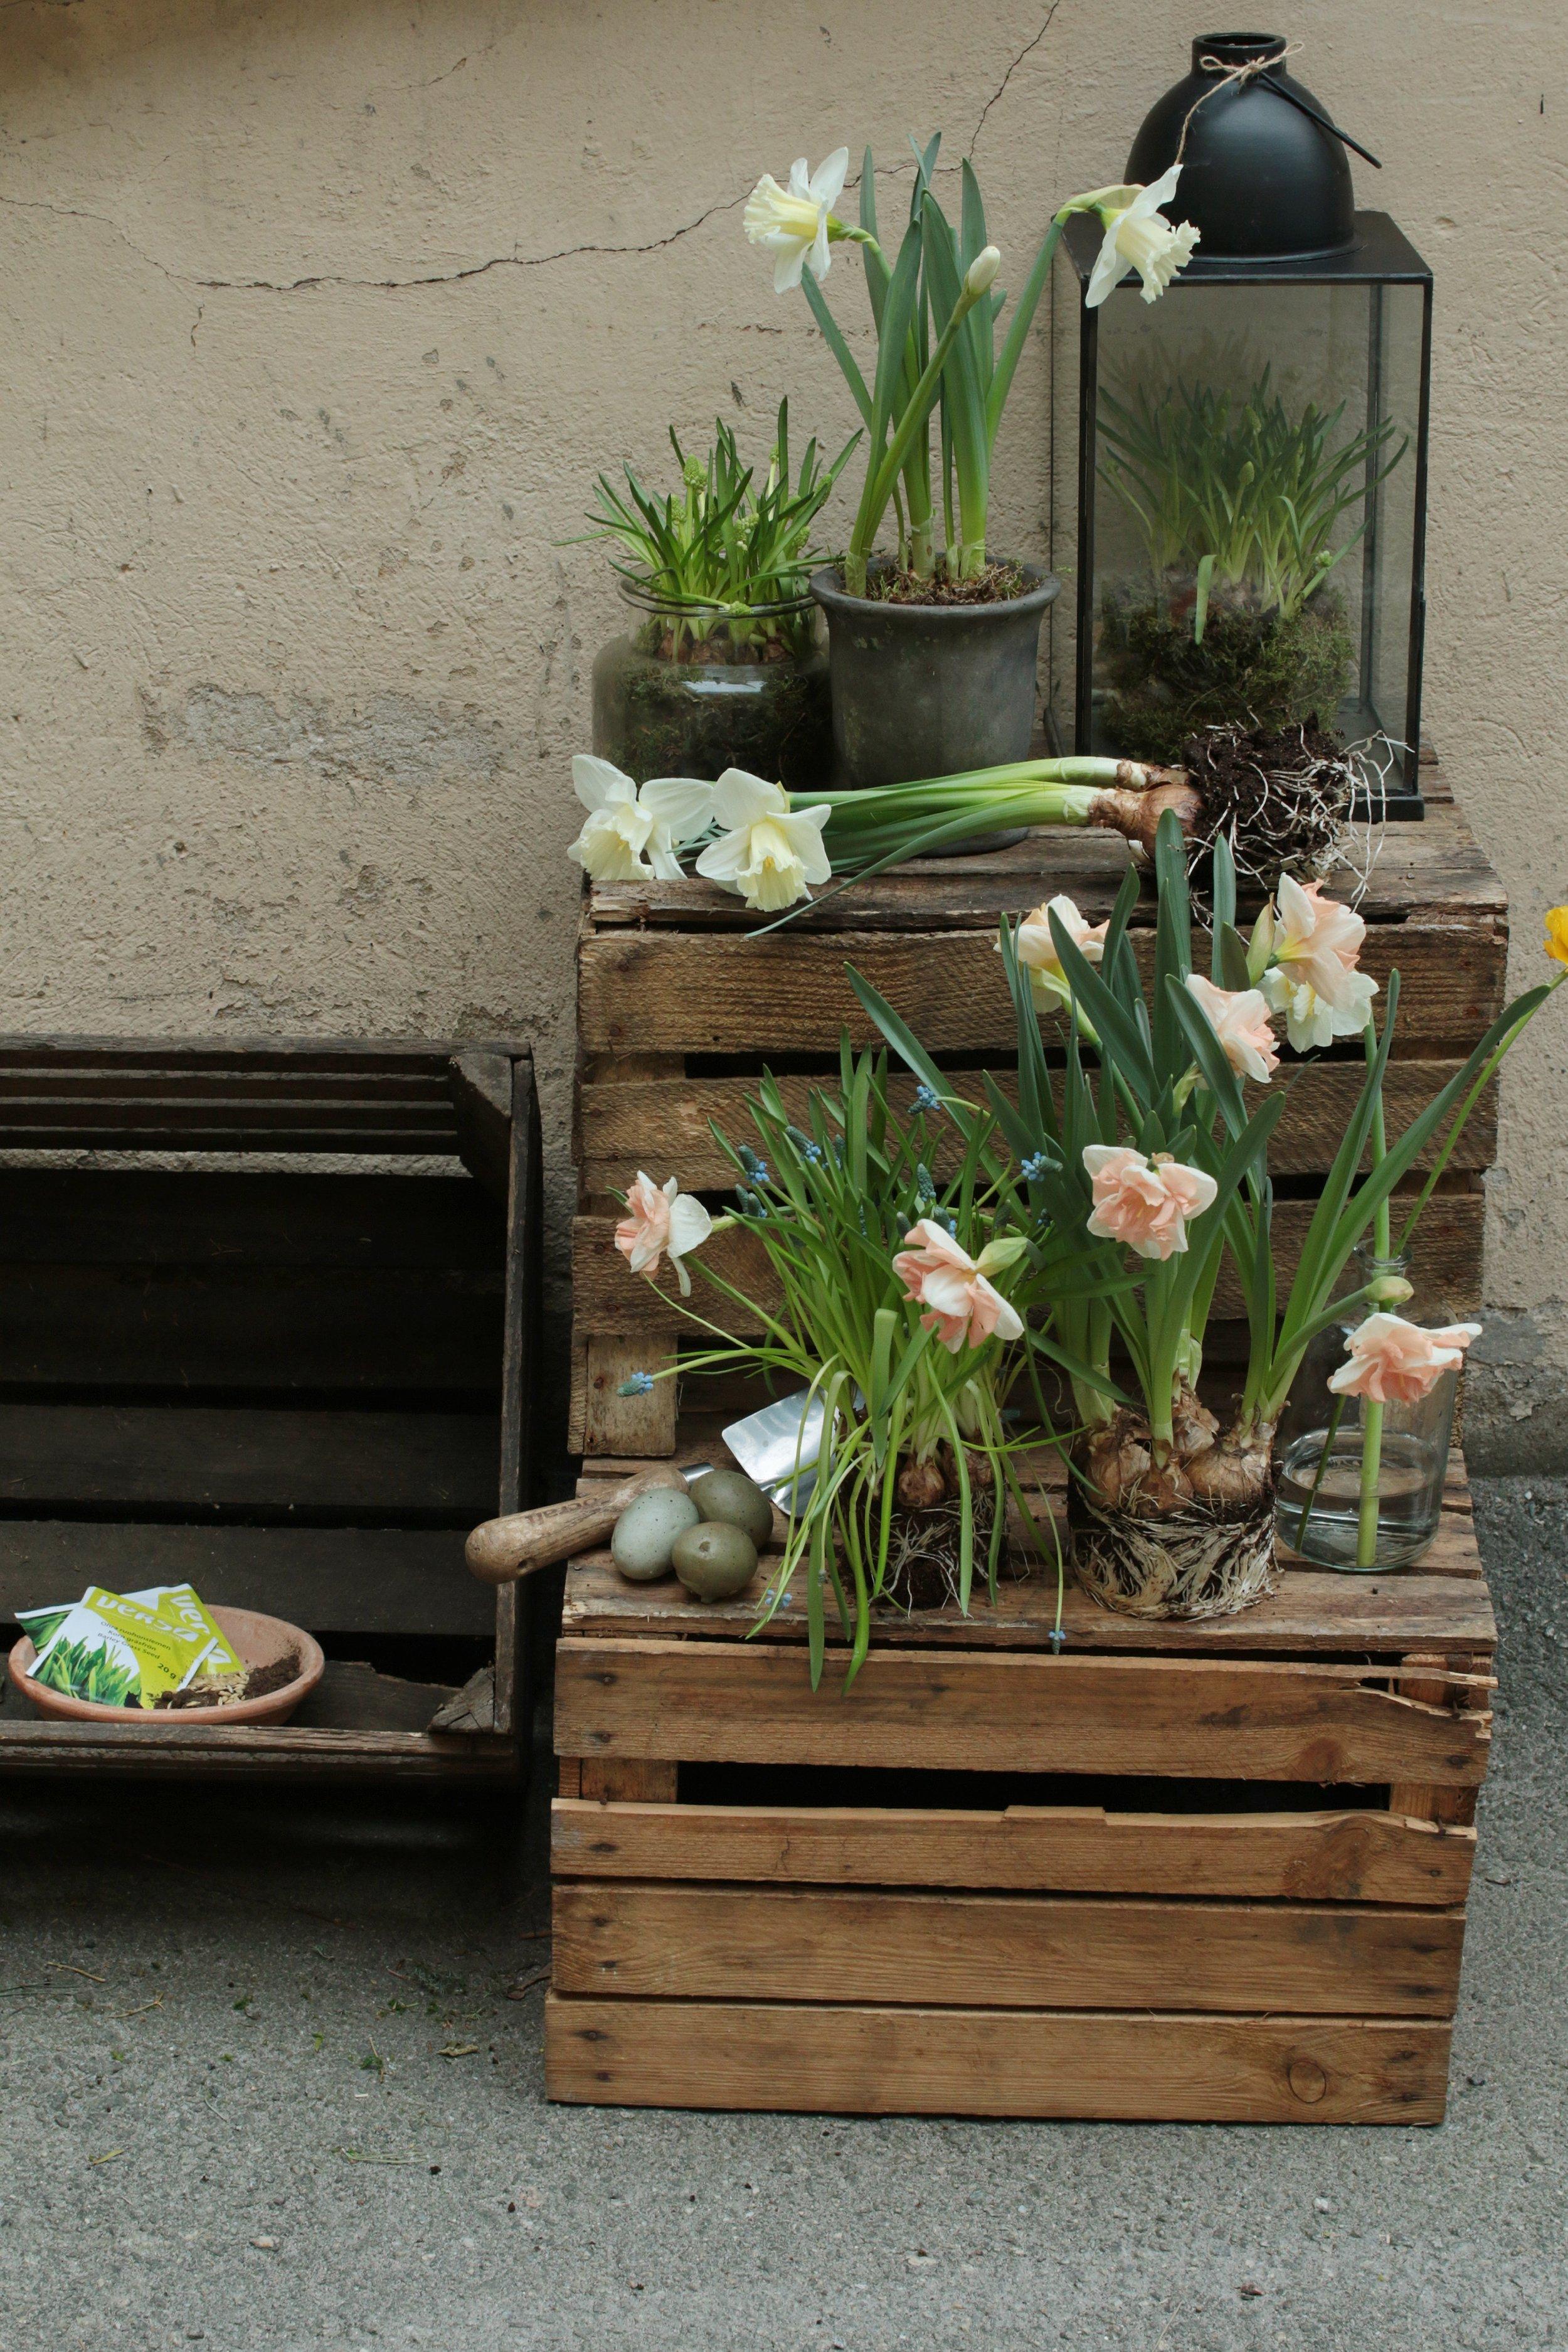 Keväiset sipulikukat ruukussa